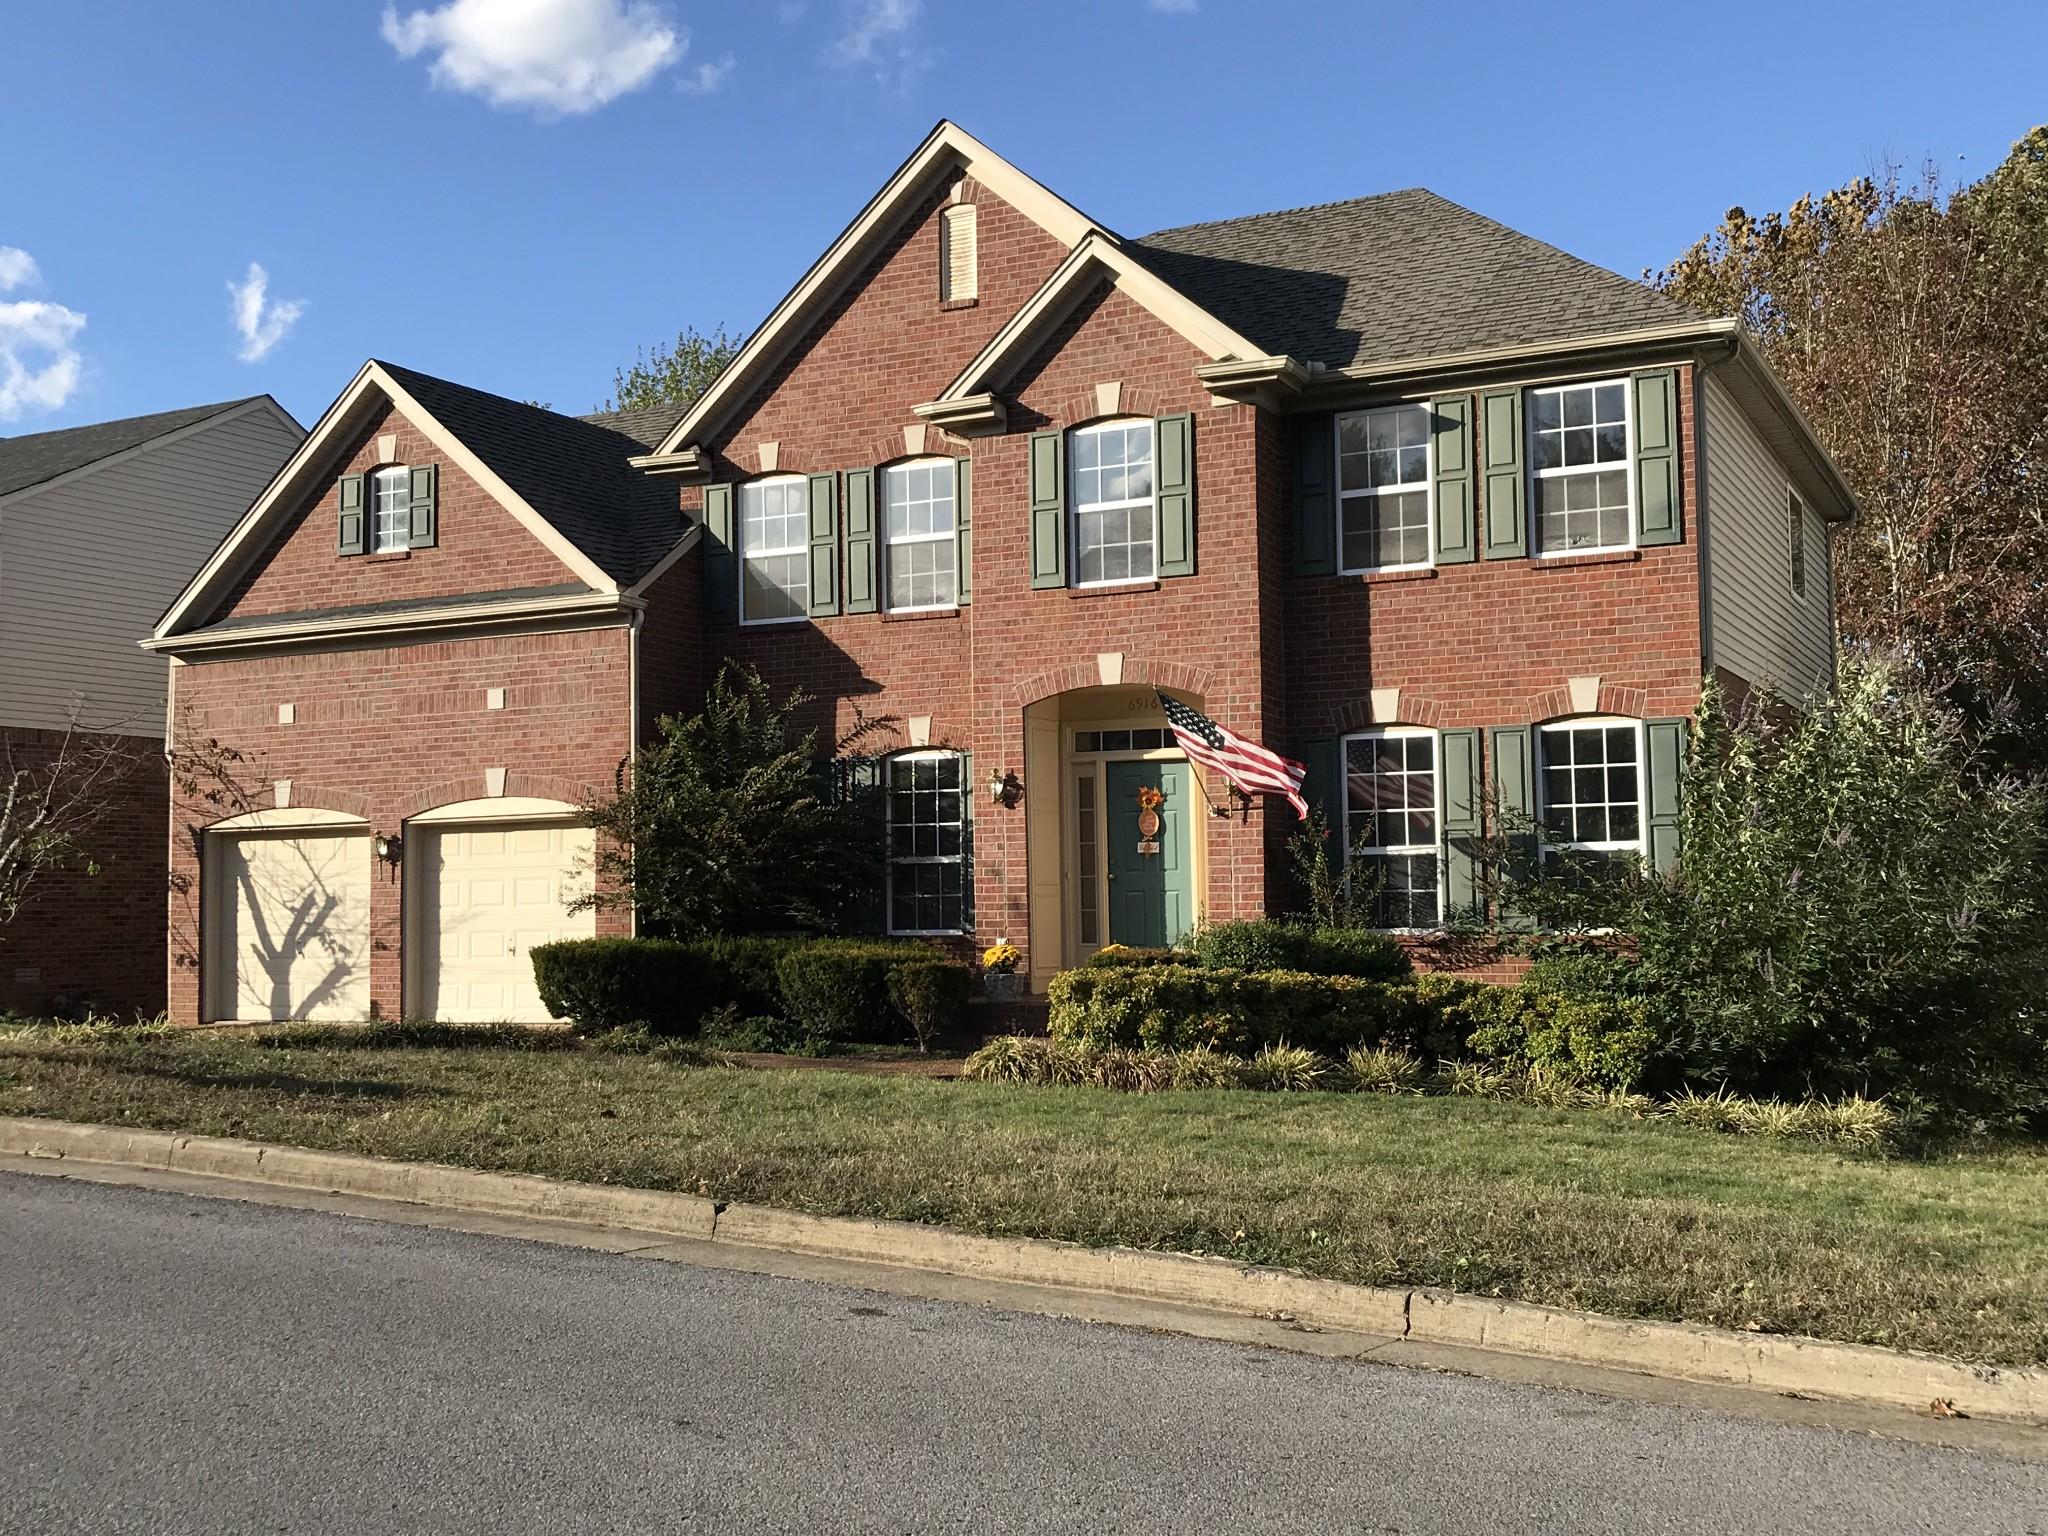 6916 Stone Run Dr, Nashville, TN 37211 - Nashville, TN real estate listing